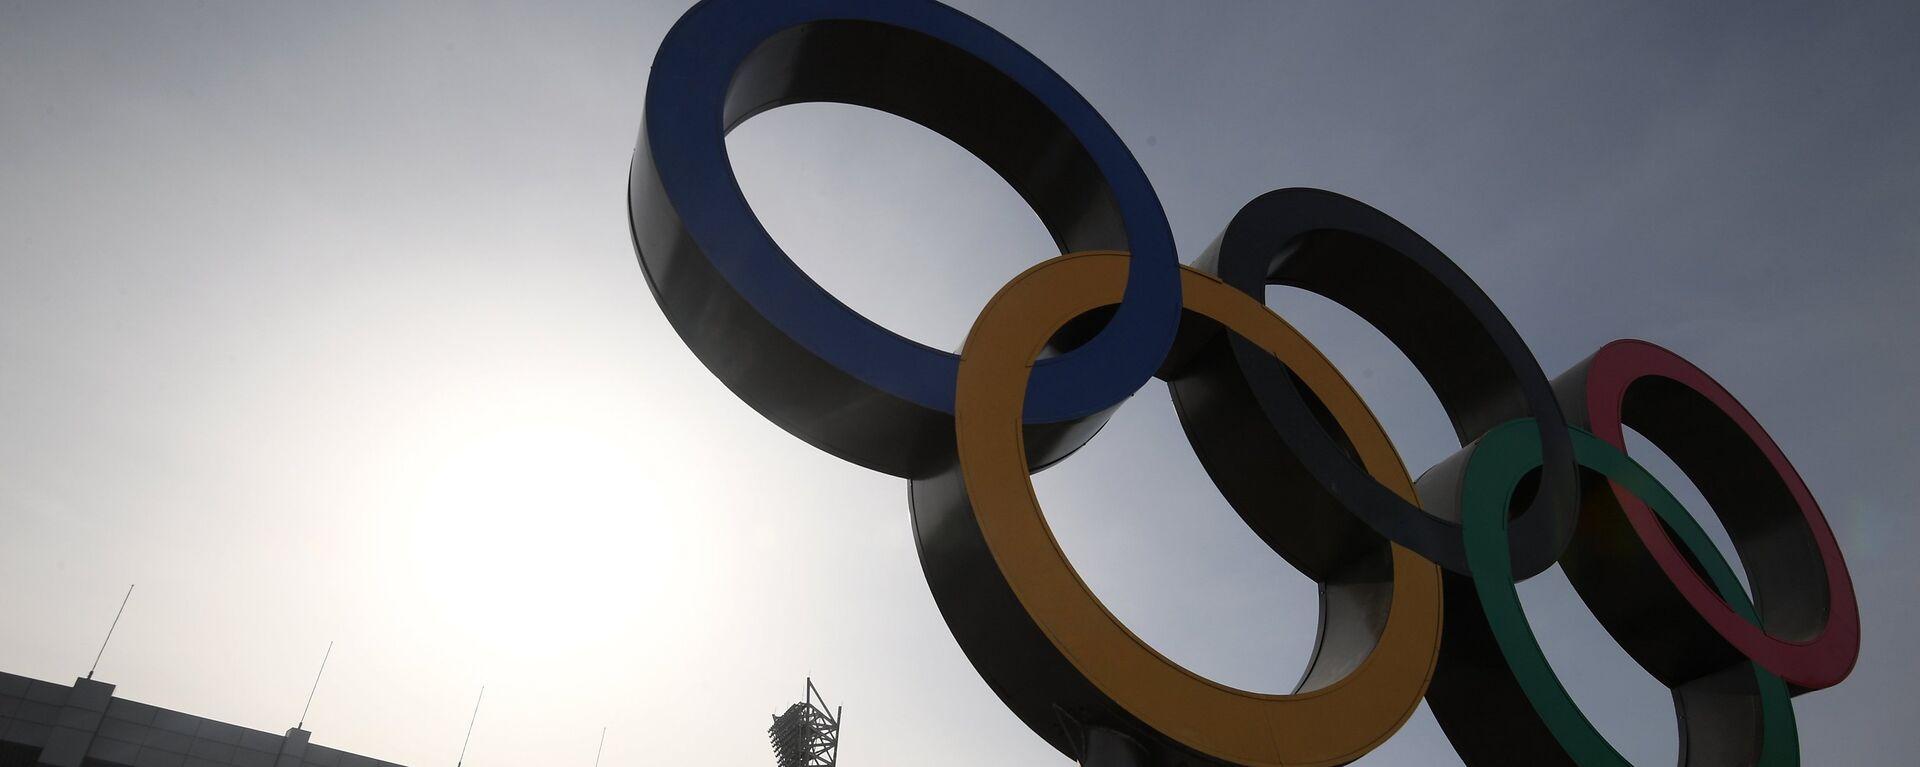 Olympic Park in Pyeongchang - Sputnik International, 1920, 01.03.2018